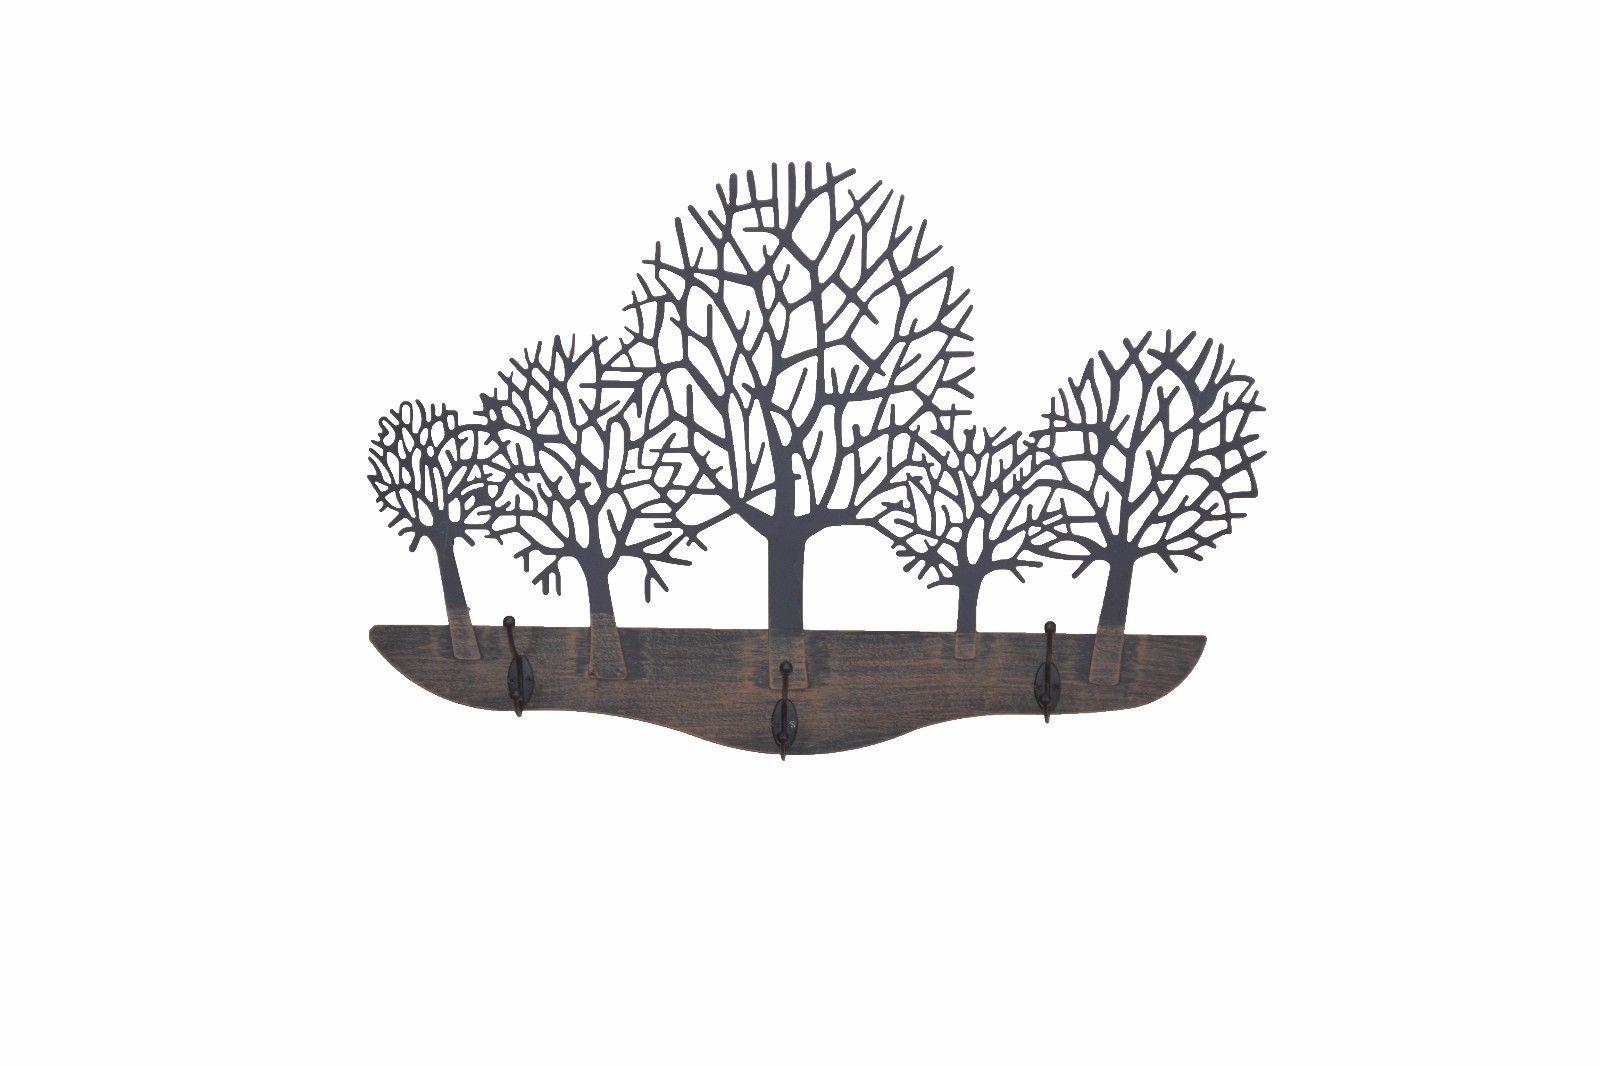 wandgarderobe wald garderobe baum flurgarderobe 3 haken aus metall antik braun kaufen bei go. Black Bedroom Furniture Sets. Home Design Ideas